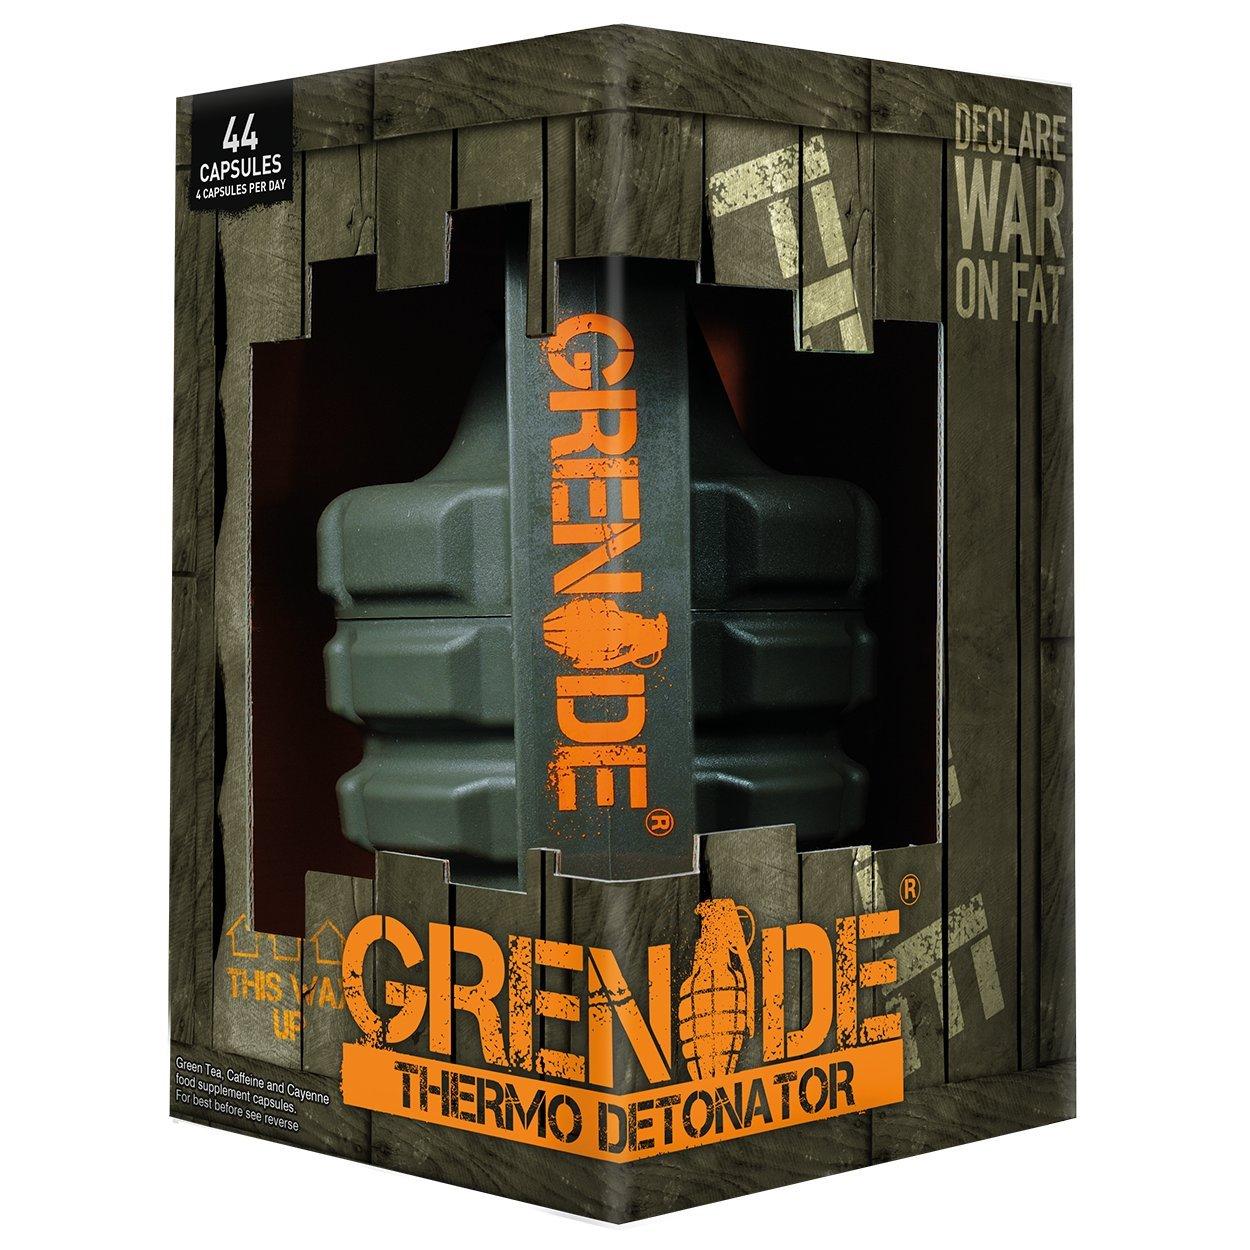 Grenade Thermo Detonator 44 capsule